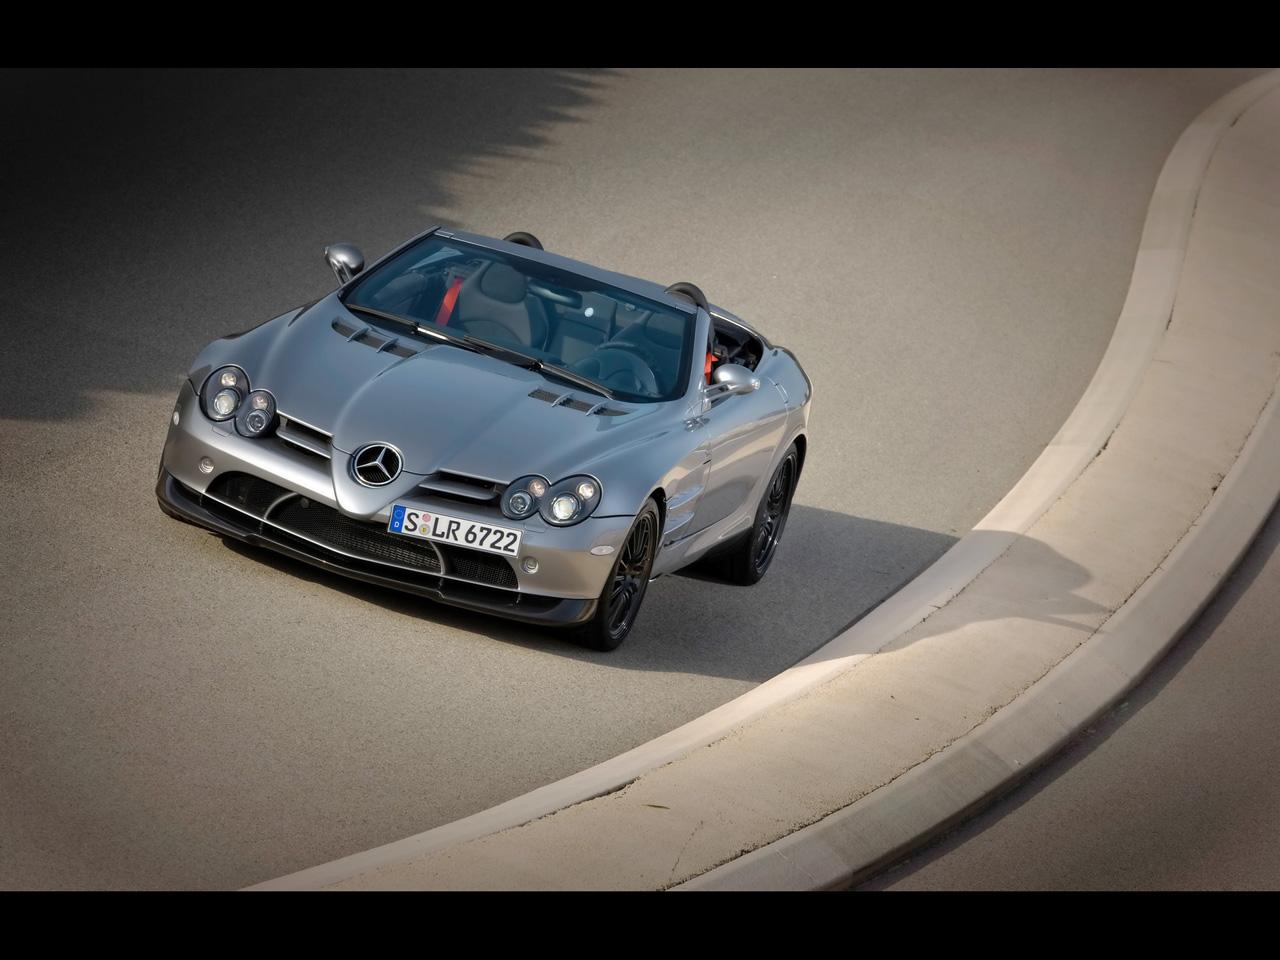 2009-Mercedes-Benz-SLR-McLaren-Roadster-722-S-Front-Angle-Topless-1280x960.jpg